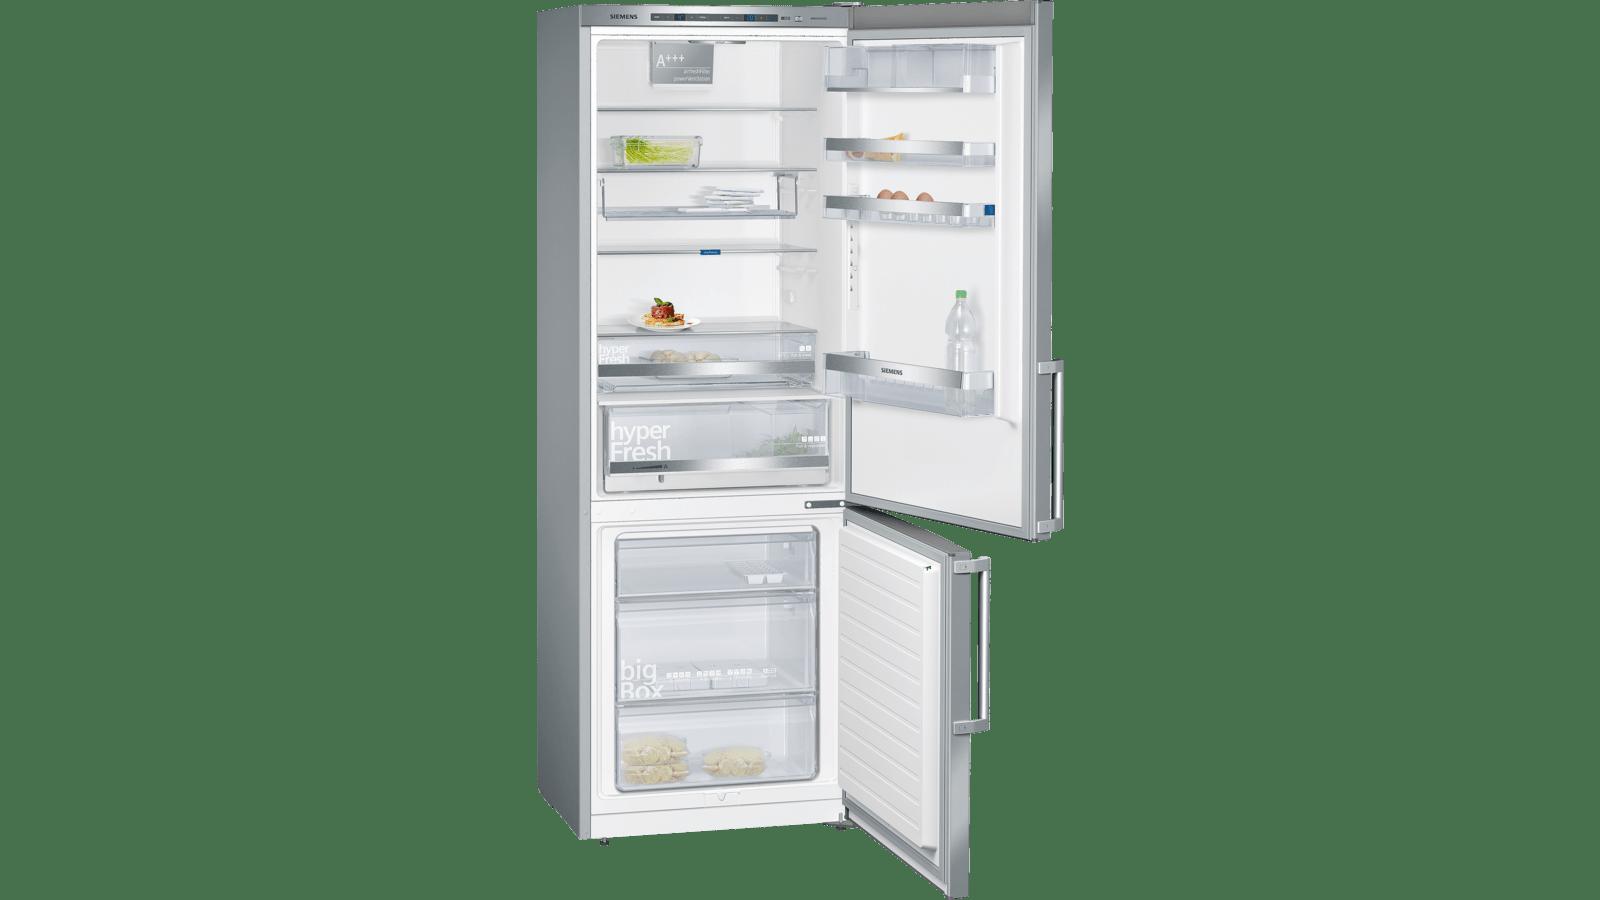 Siemens Kg49ebi40 Refrigerateur Combine Pose Libre